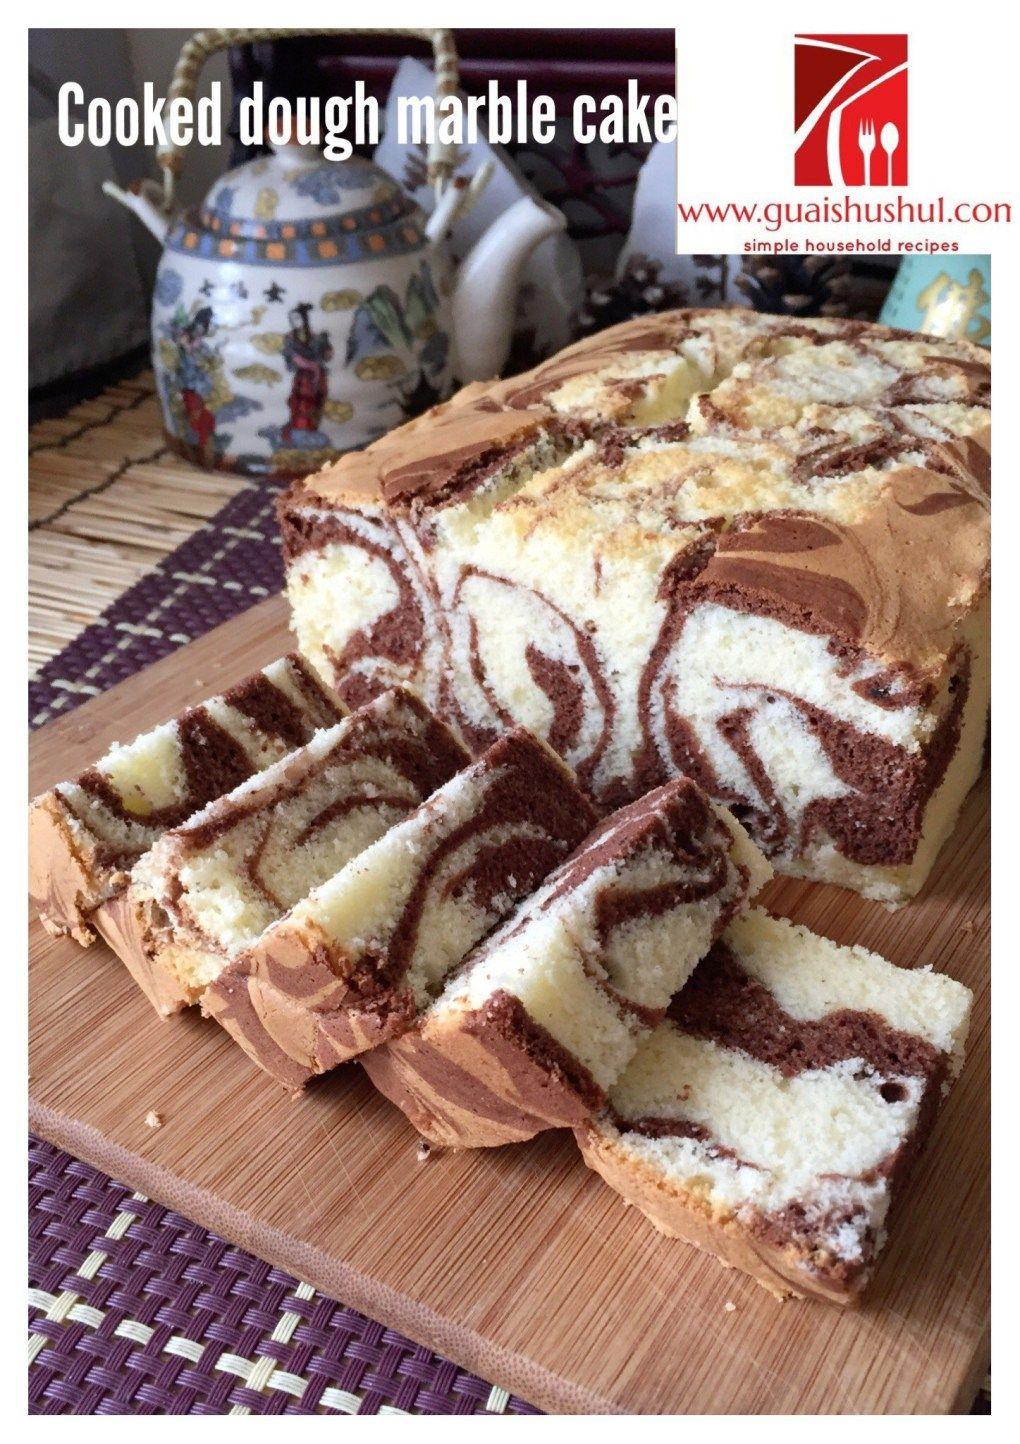 Classic Marble Cake 古早味云石蛋糕 Guai Shu Shu Marble Cake Recipes Marble Cake Recipe Moist Marble Cake